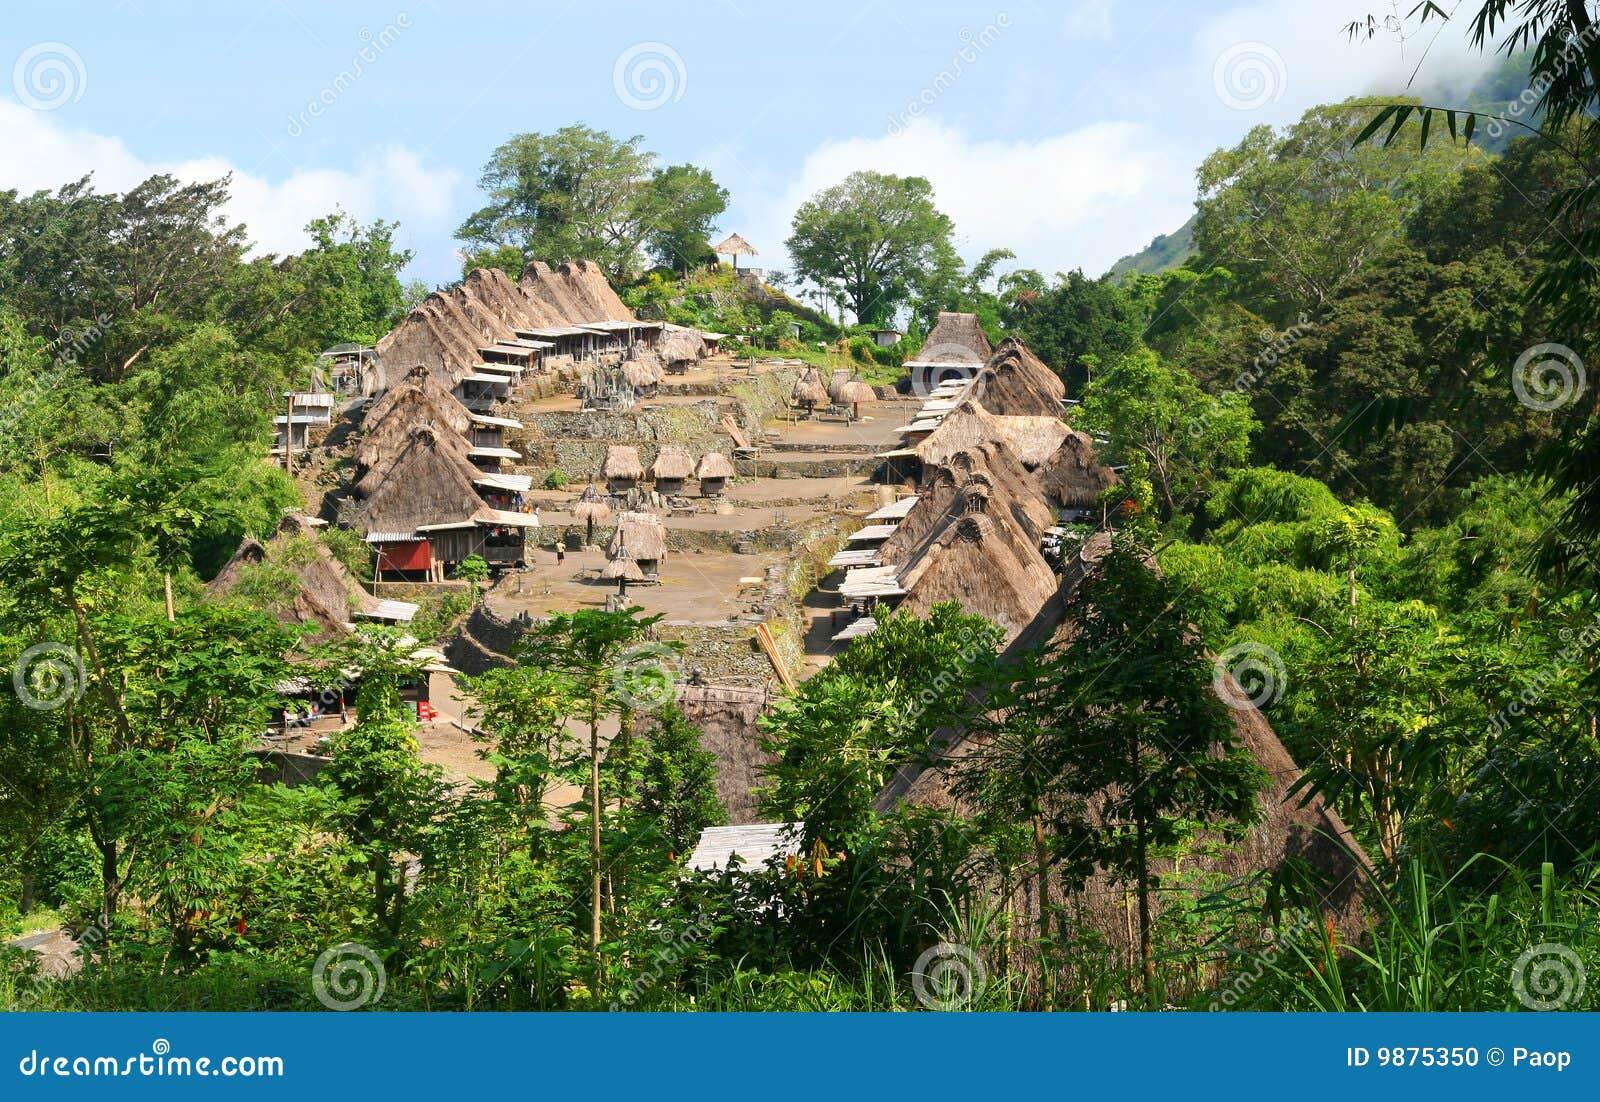 Village de bena